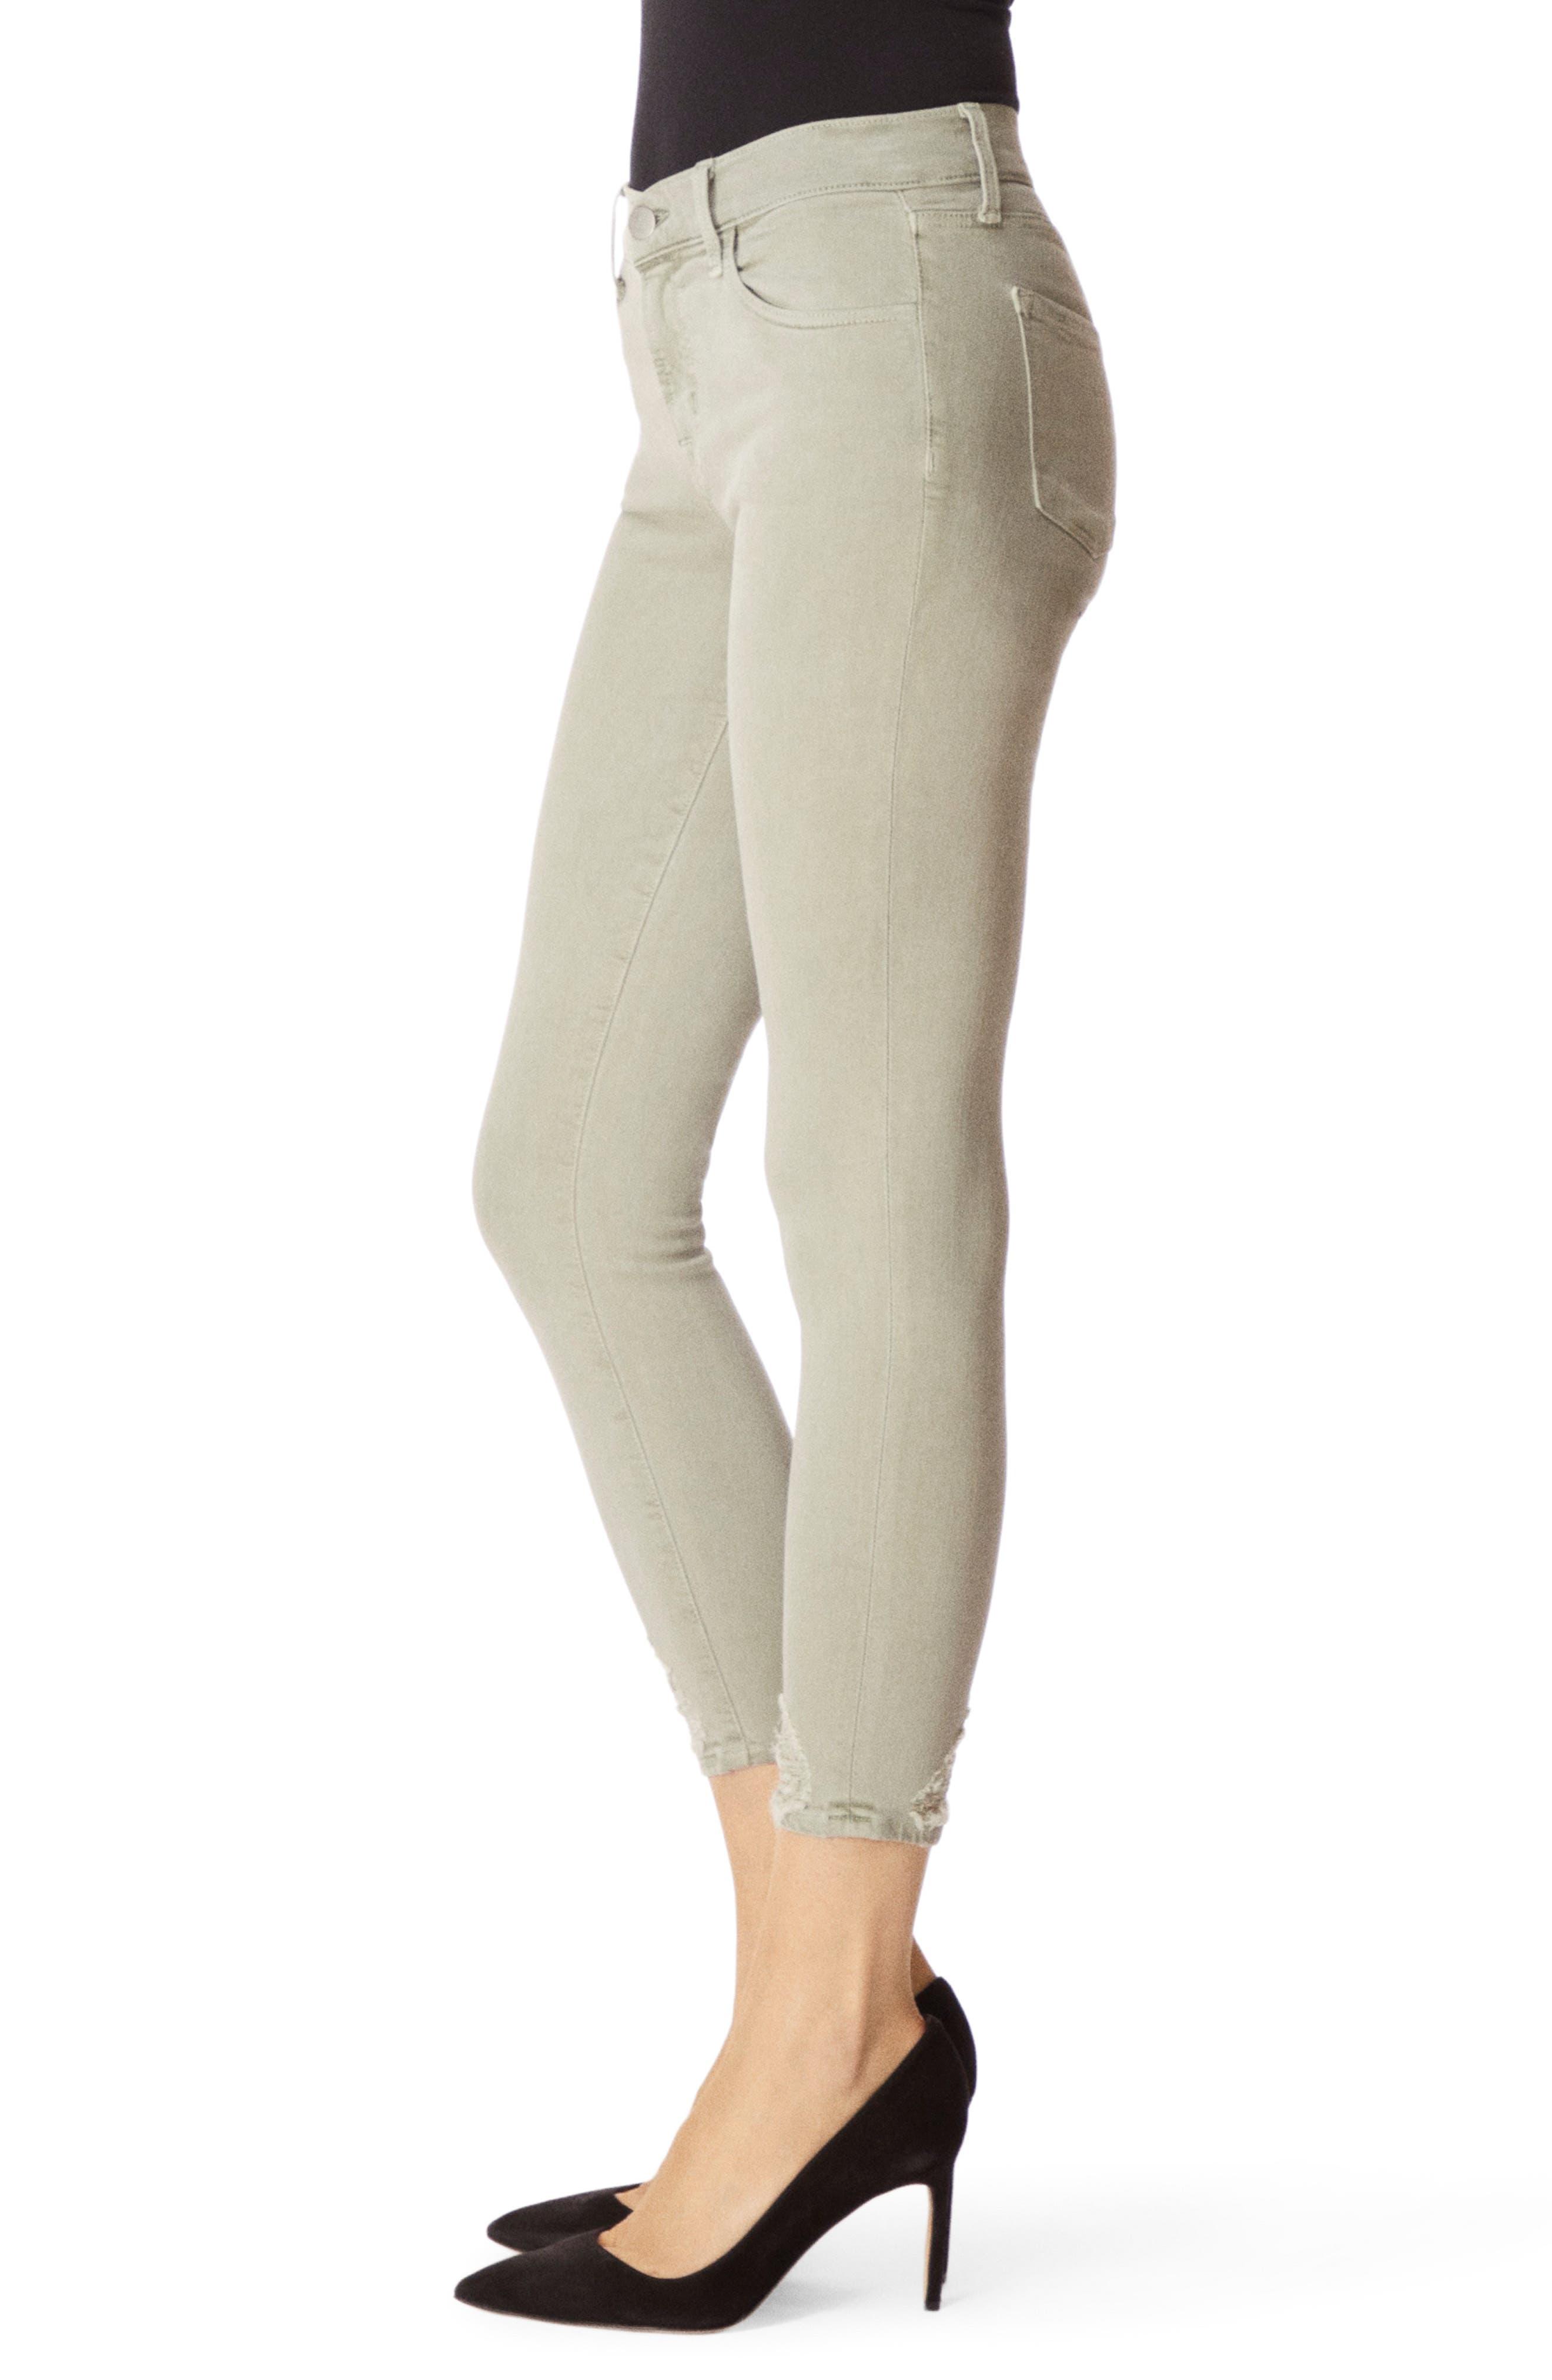 J BRAND, 835 Capri Skinny Jeans, Alternate thumbnail 3, color, FADED GIBSON DESTRUCT